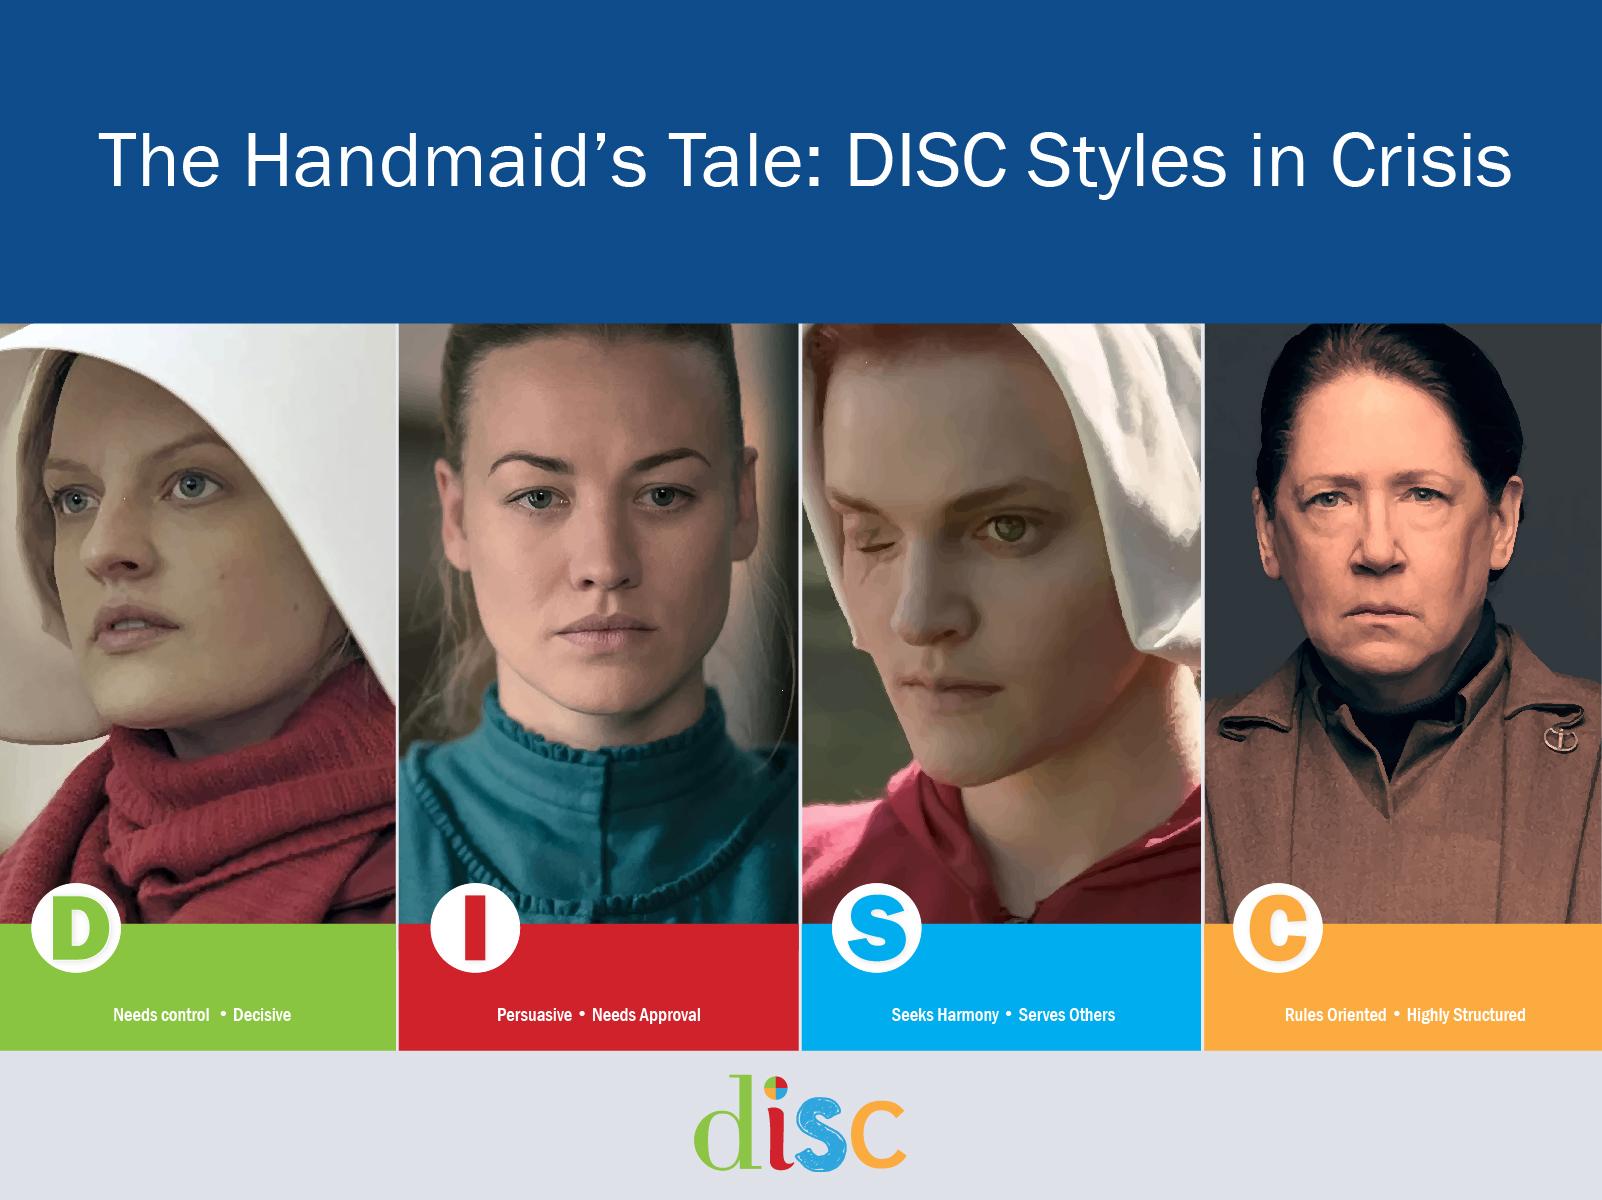 Handmaid's Tale DISC